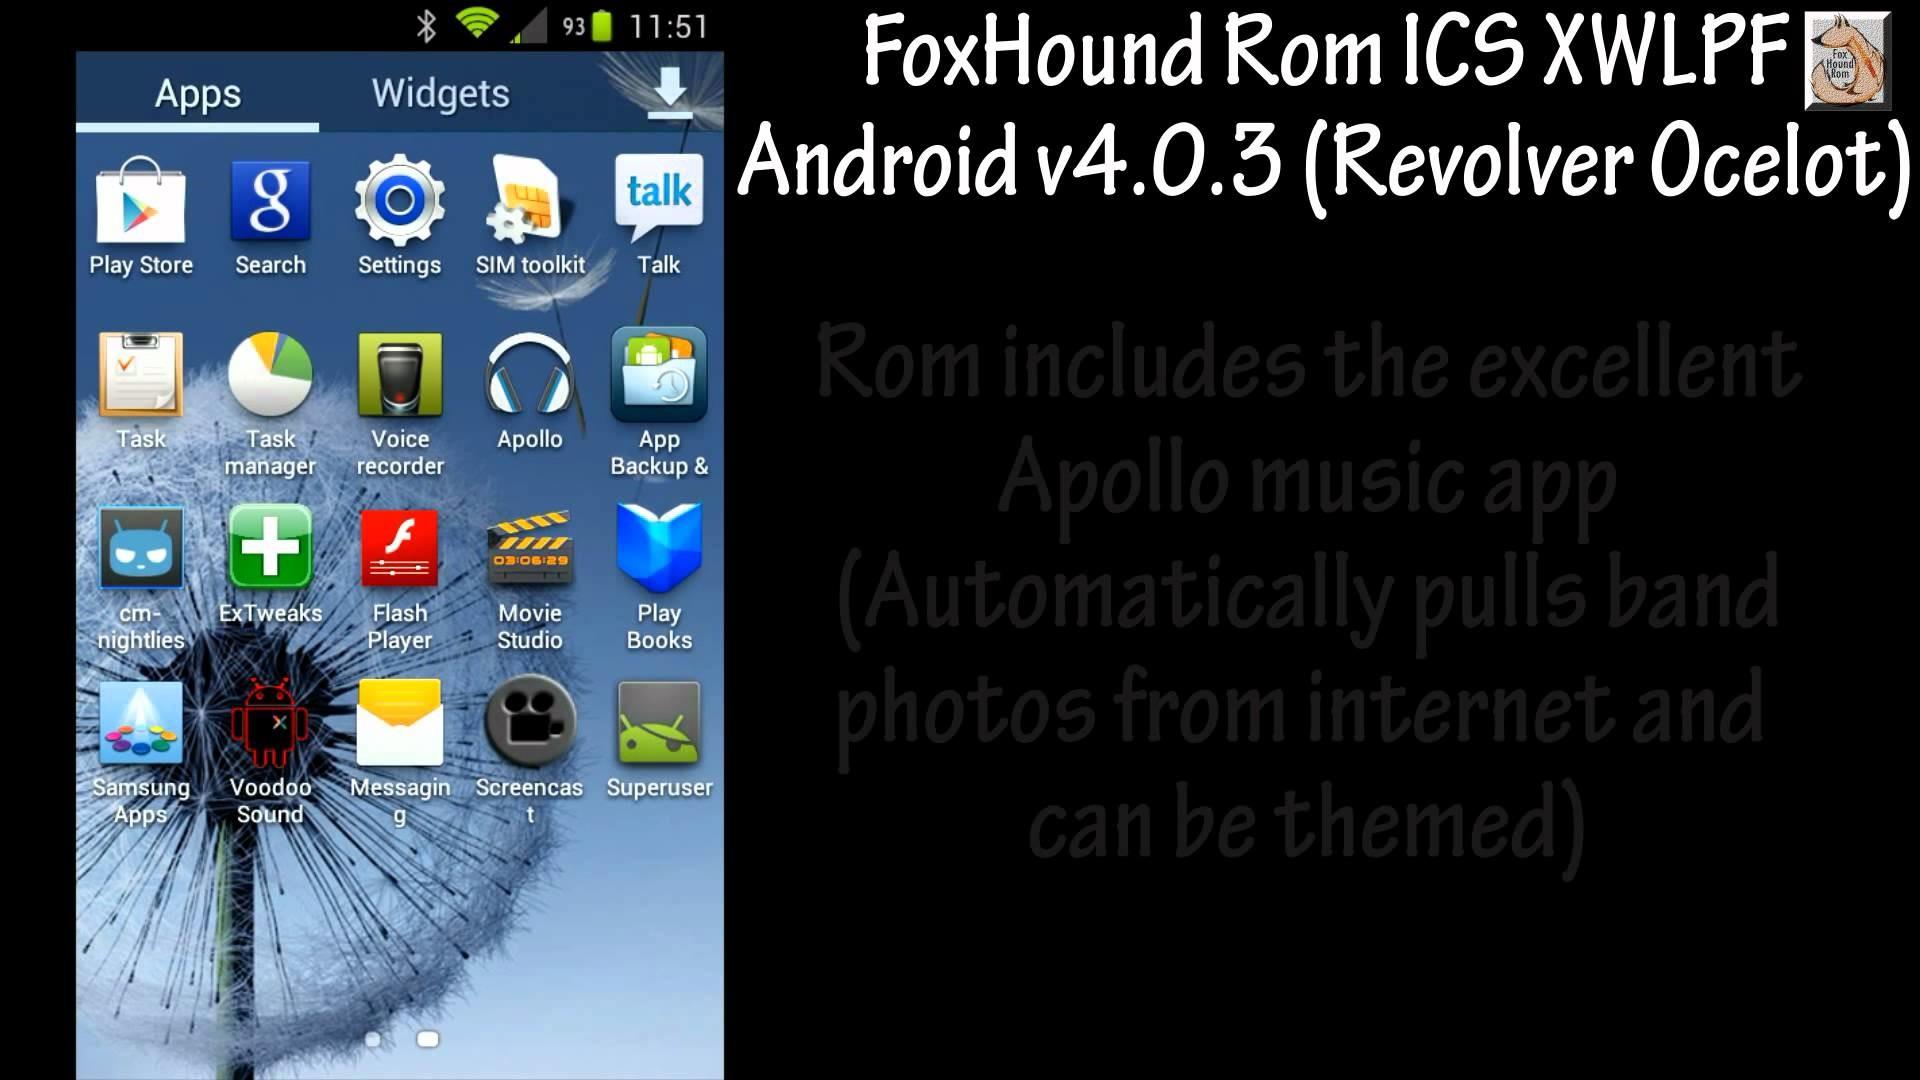 Samsung Galaxy S II GT-I9100 FoxHound Rom ICS XXLPS XWLPF Android v4.0.3  (Revolver_Ocelot)